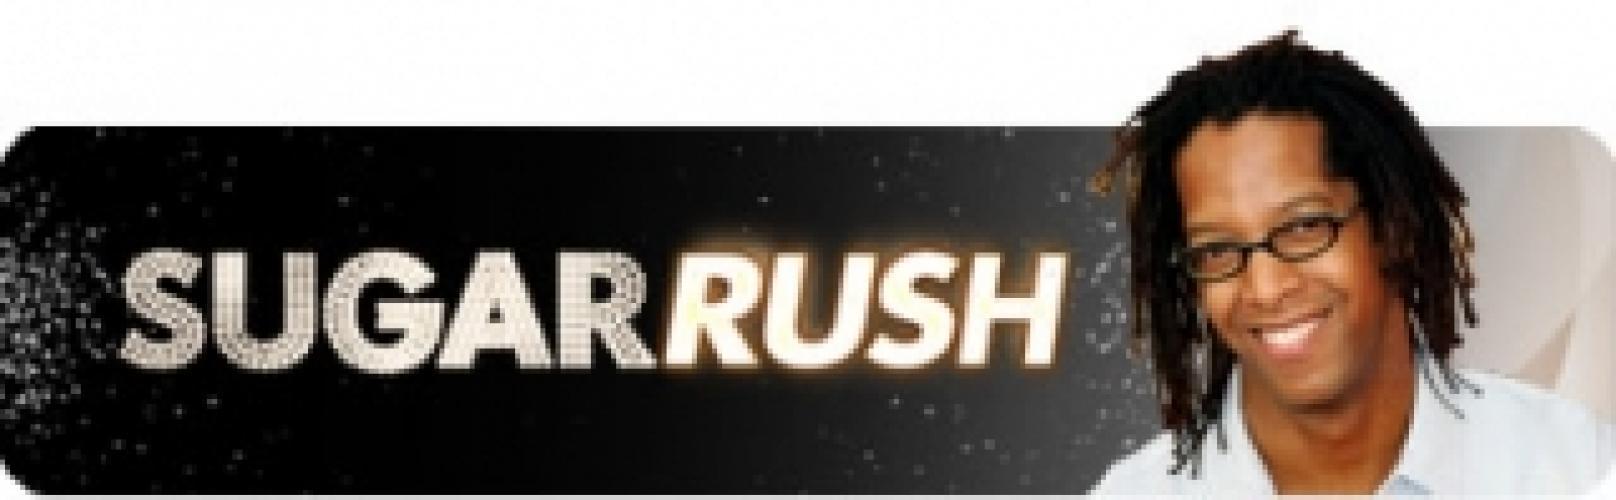 Sugar Rush (US) next episode air date poster